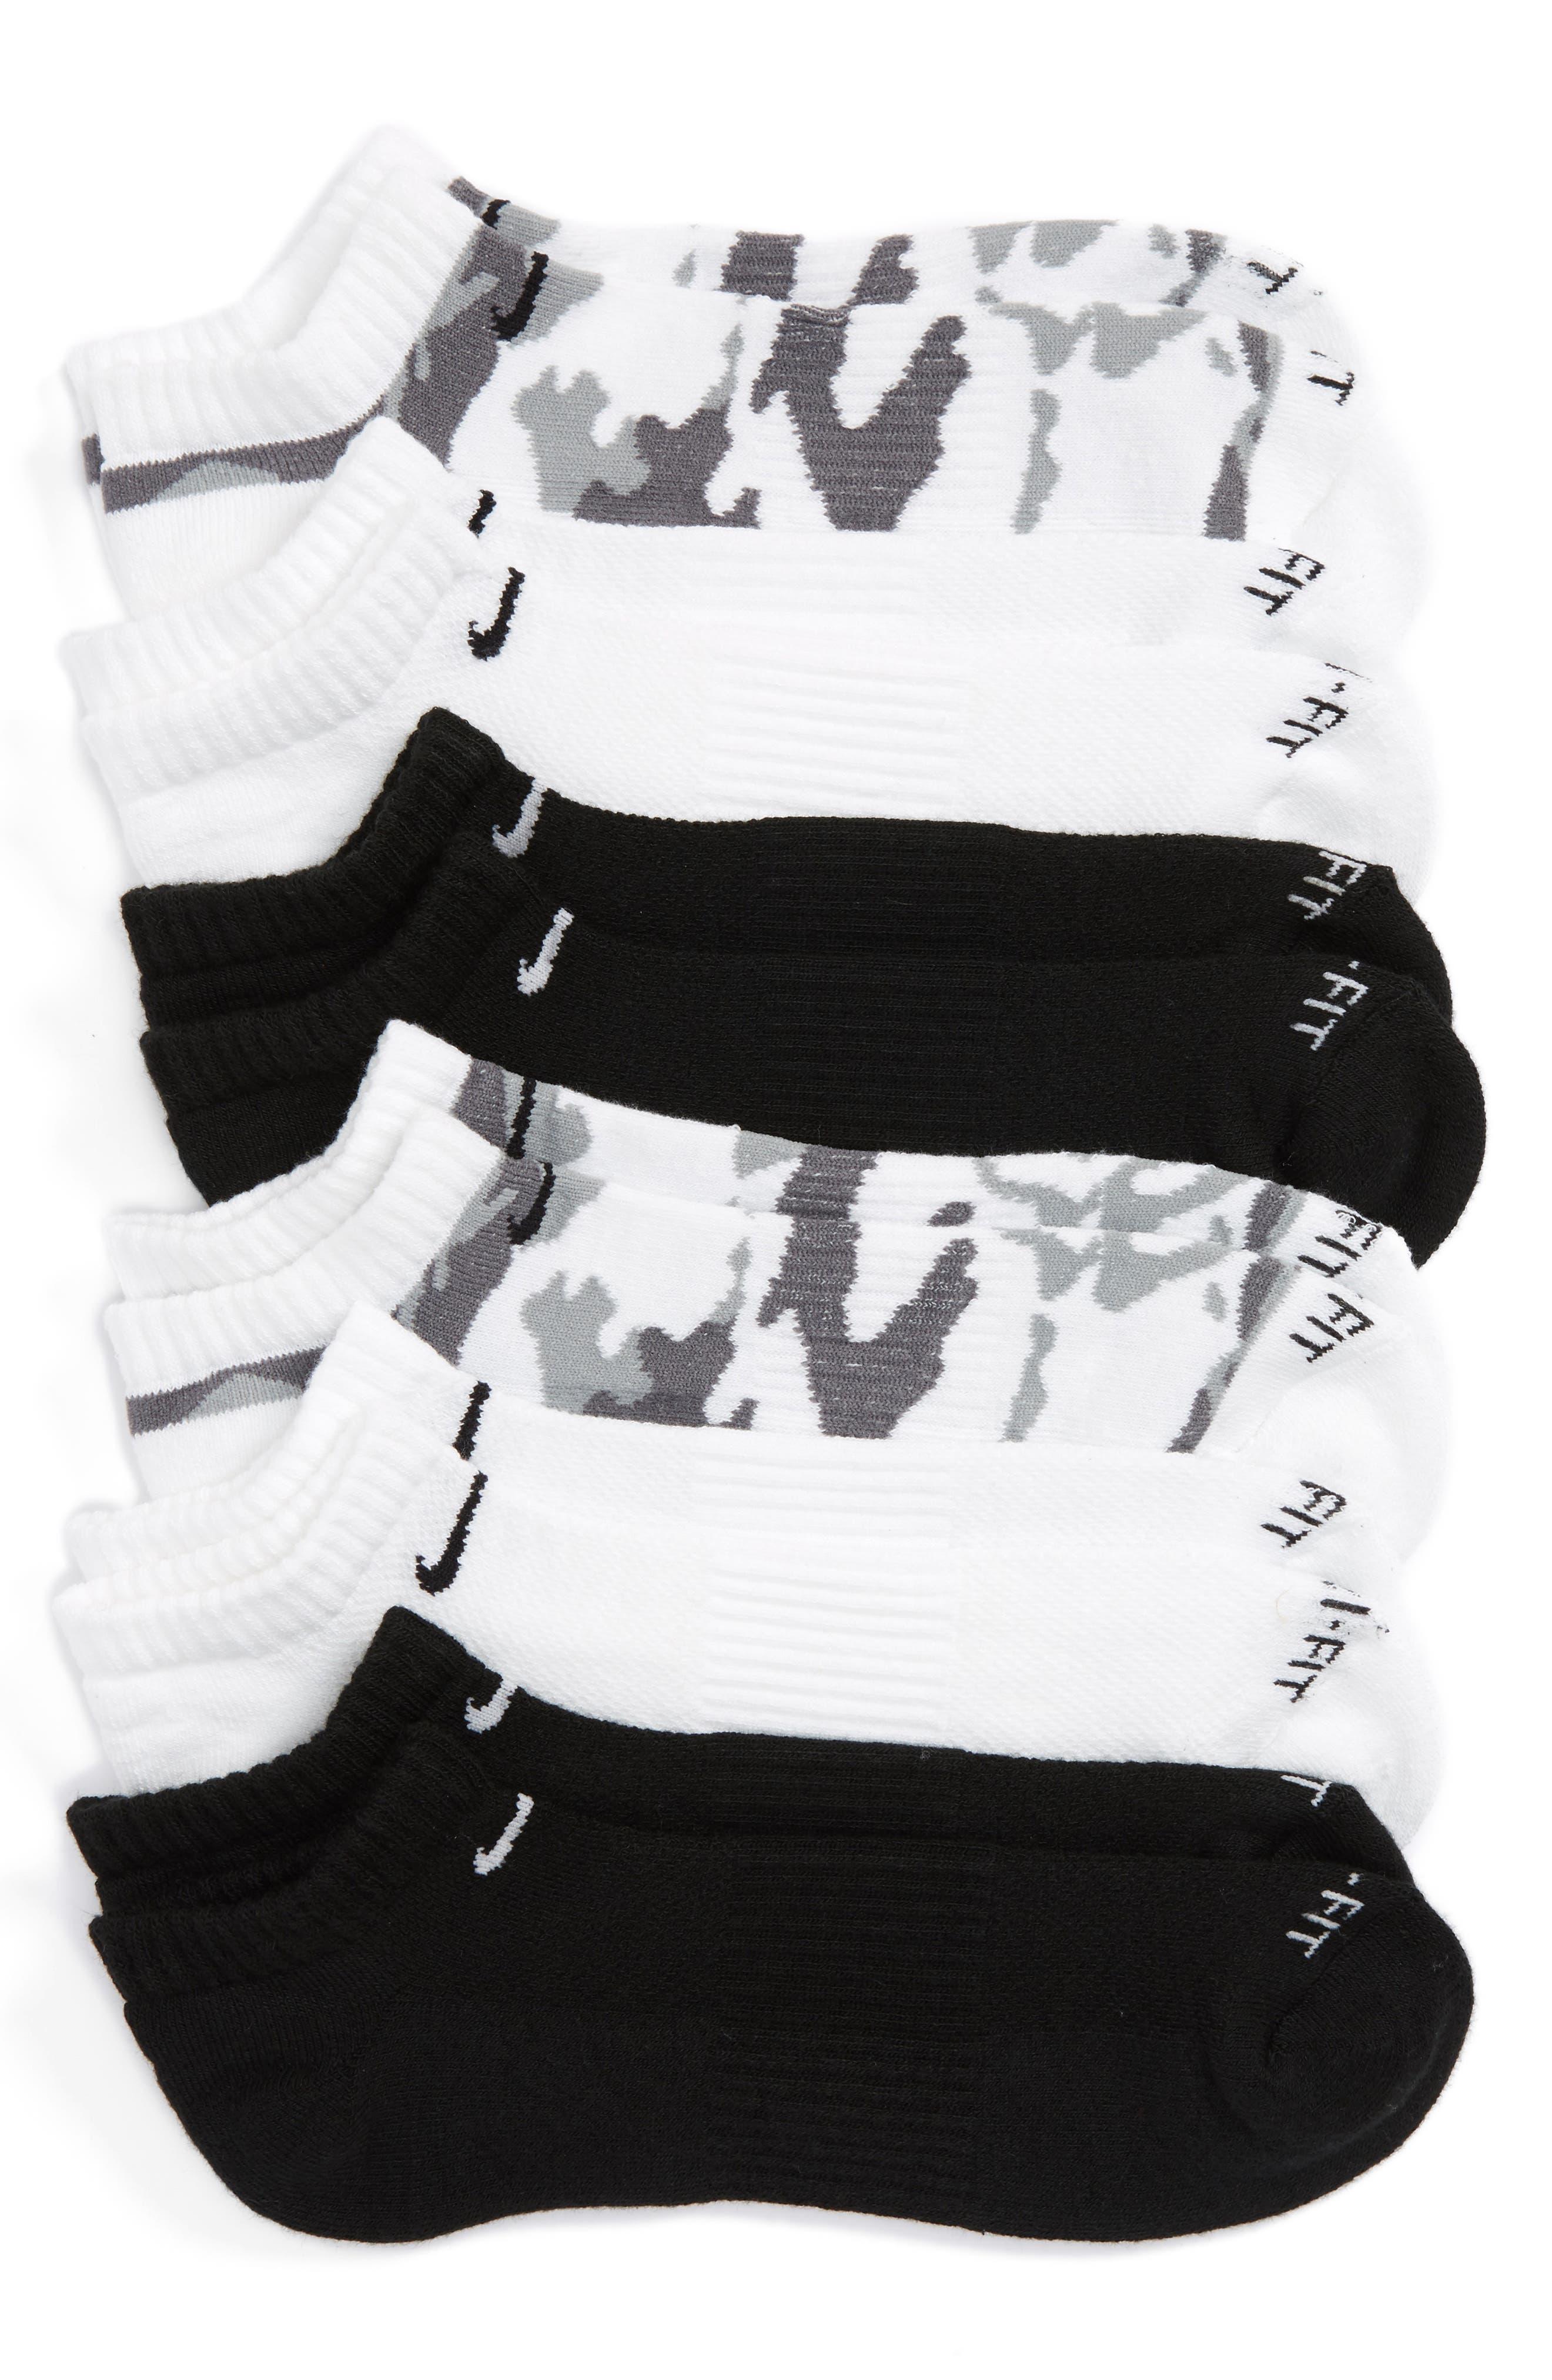 6-Pack Dri-FIT No-Show Socks,                             Main thumbnail 1, color,                             020